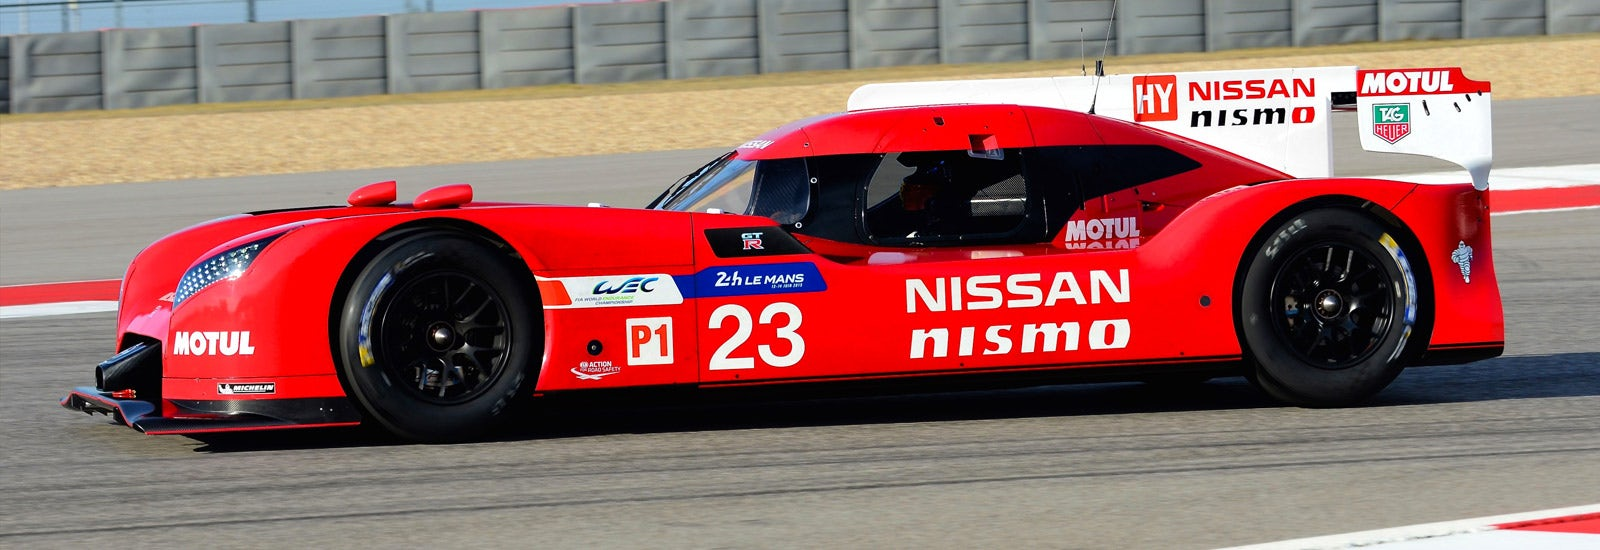 Nissan GT-R R36 Skyline price specs release date | carwow